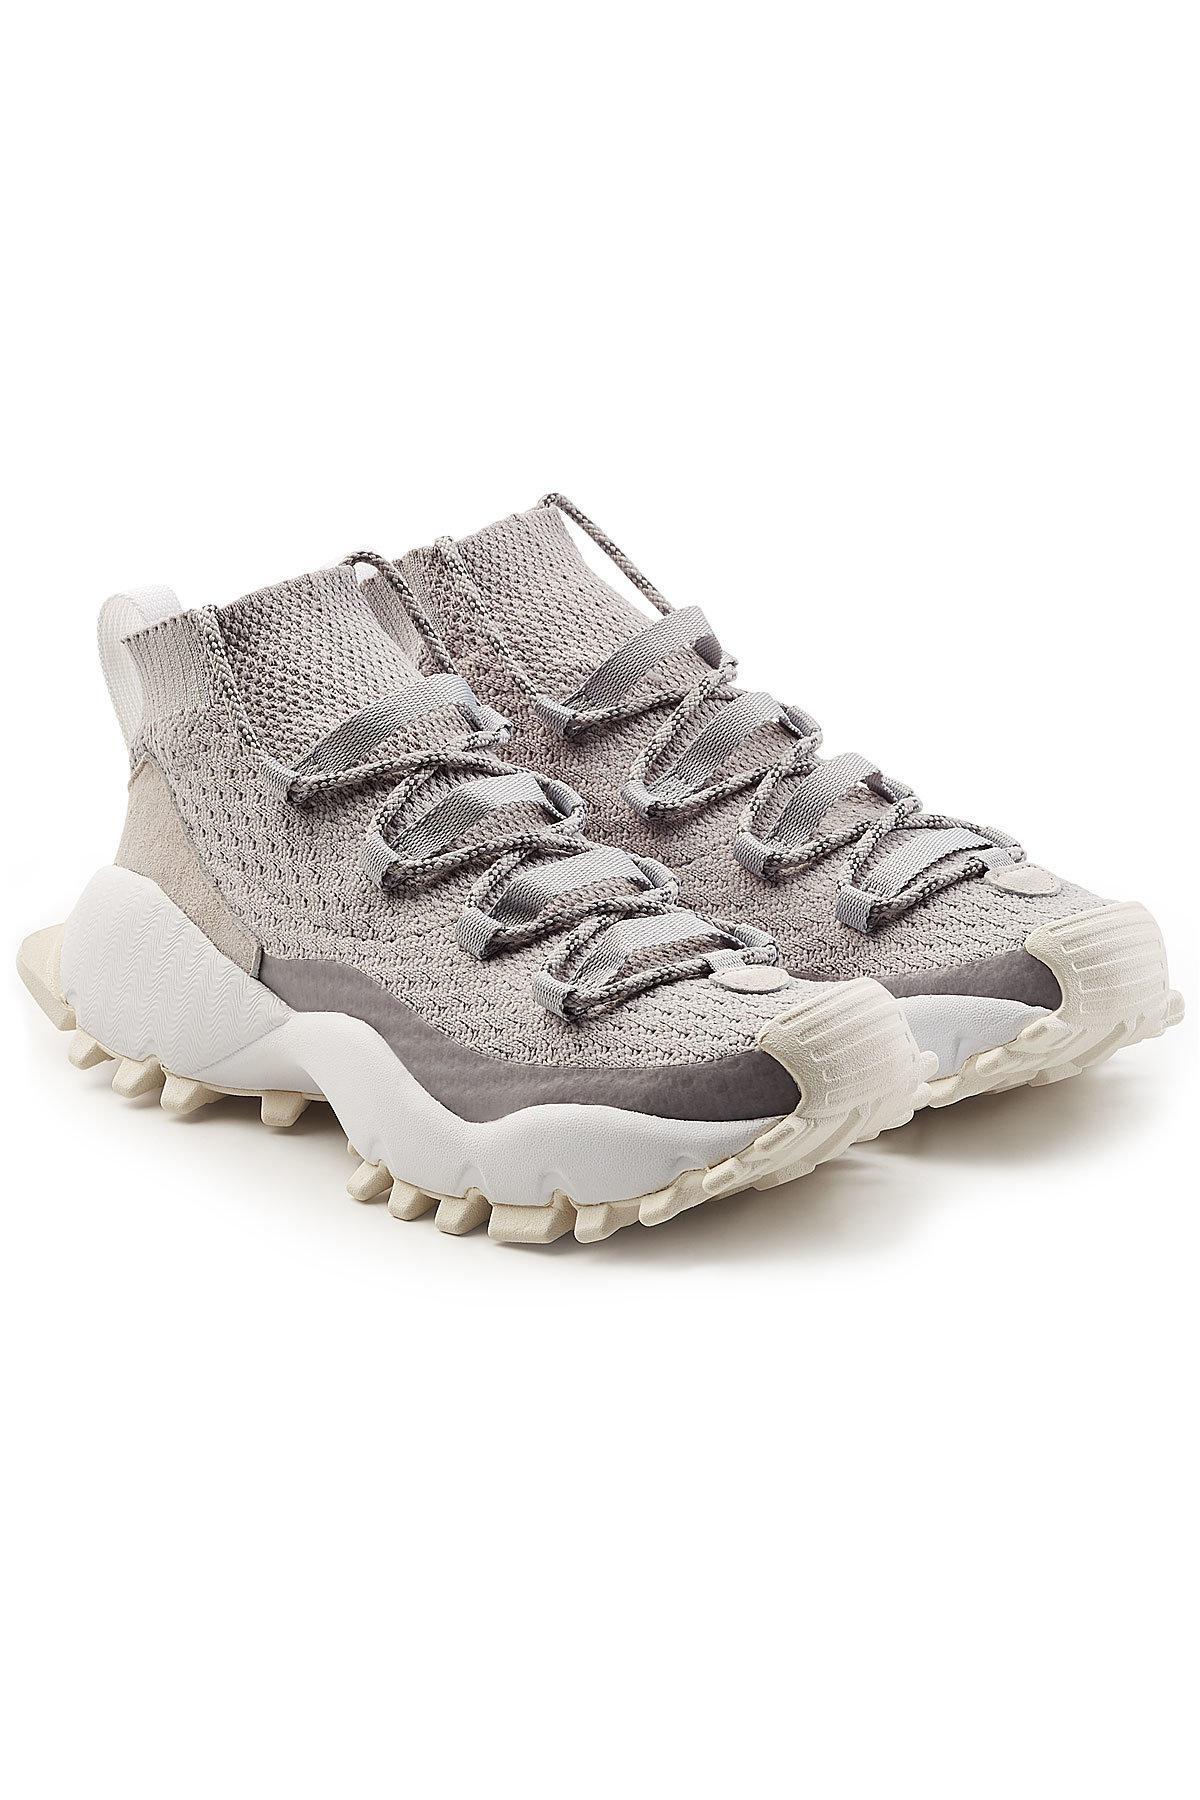 3bbba246121e adidas Originals Seeulater Primeknit Winter Sneakers in Gray for Men ...